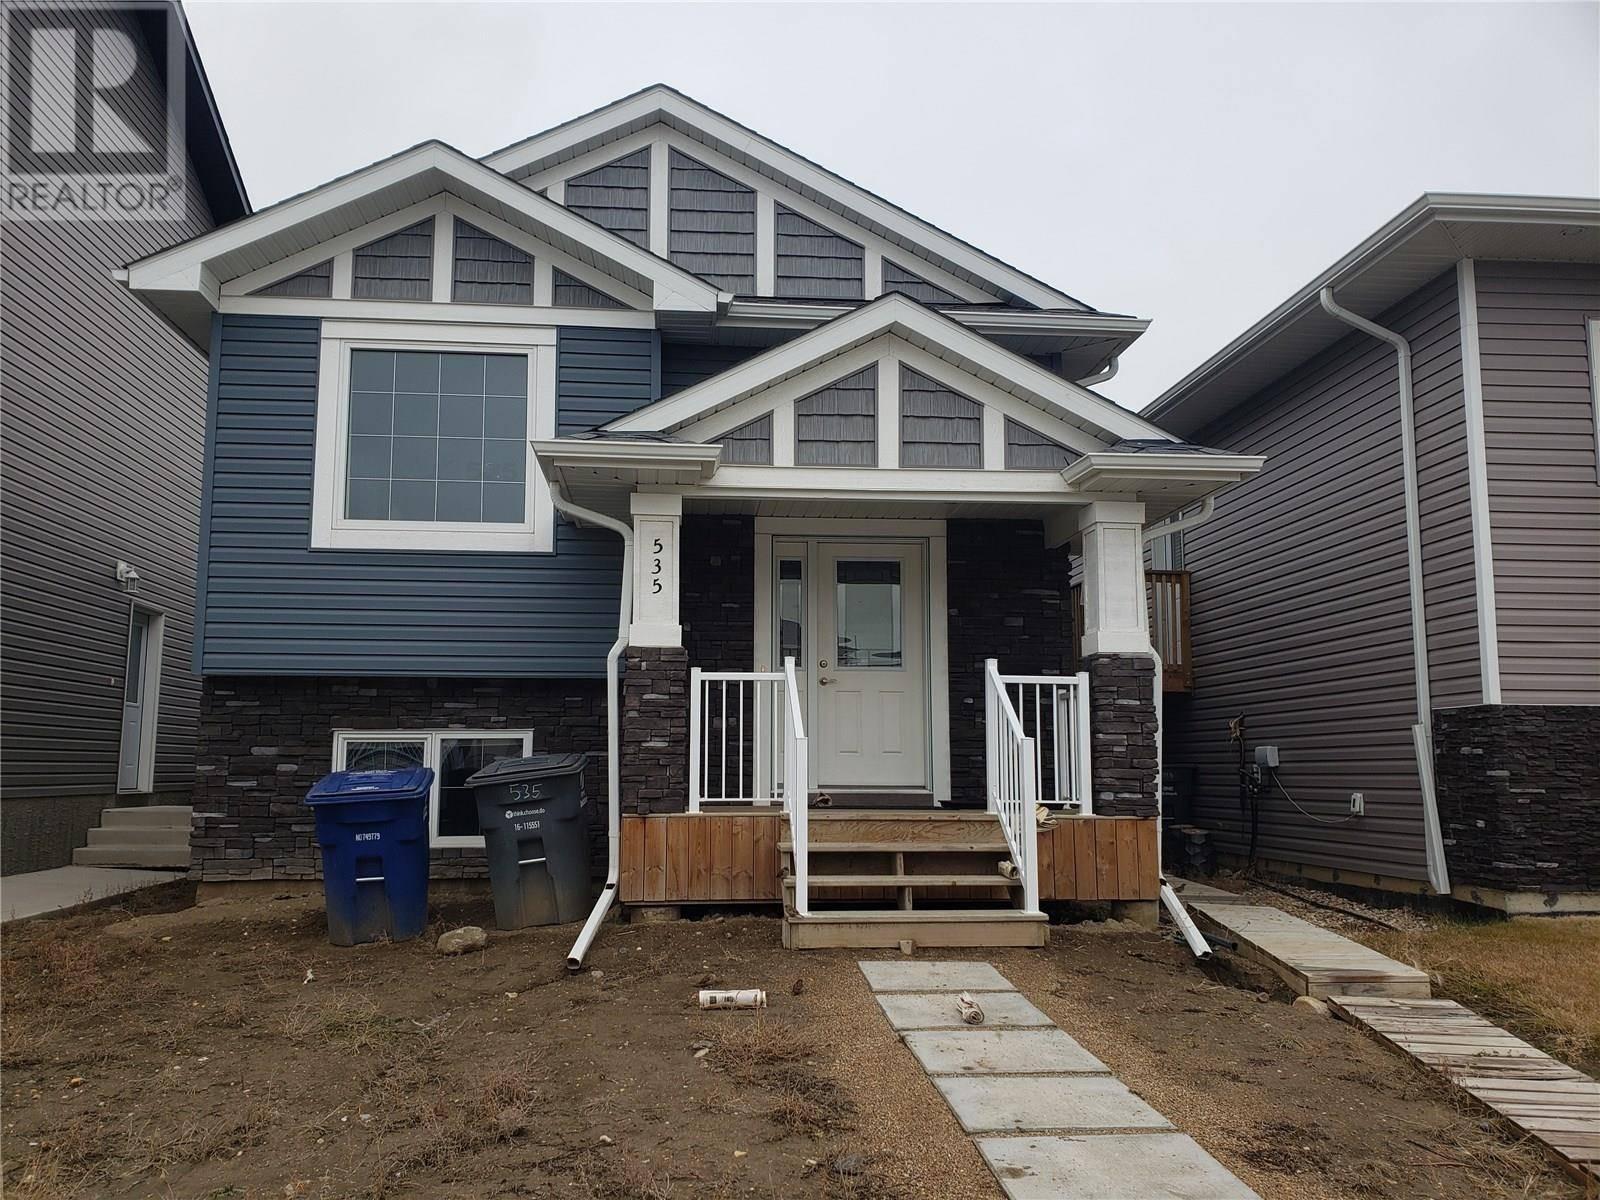 House for sale at 535 Fast Wy Saskatoon Saskatchewan - MLS: SK792798